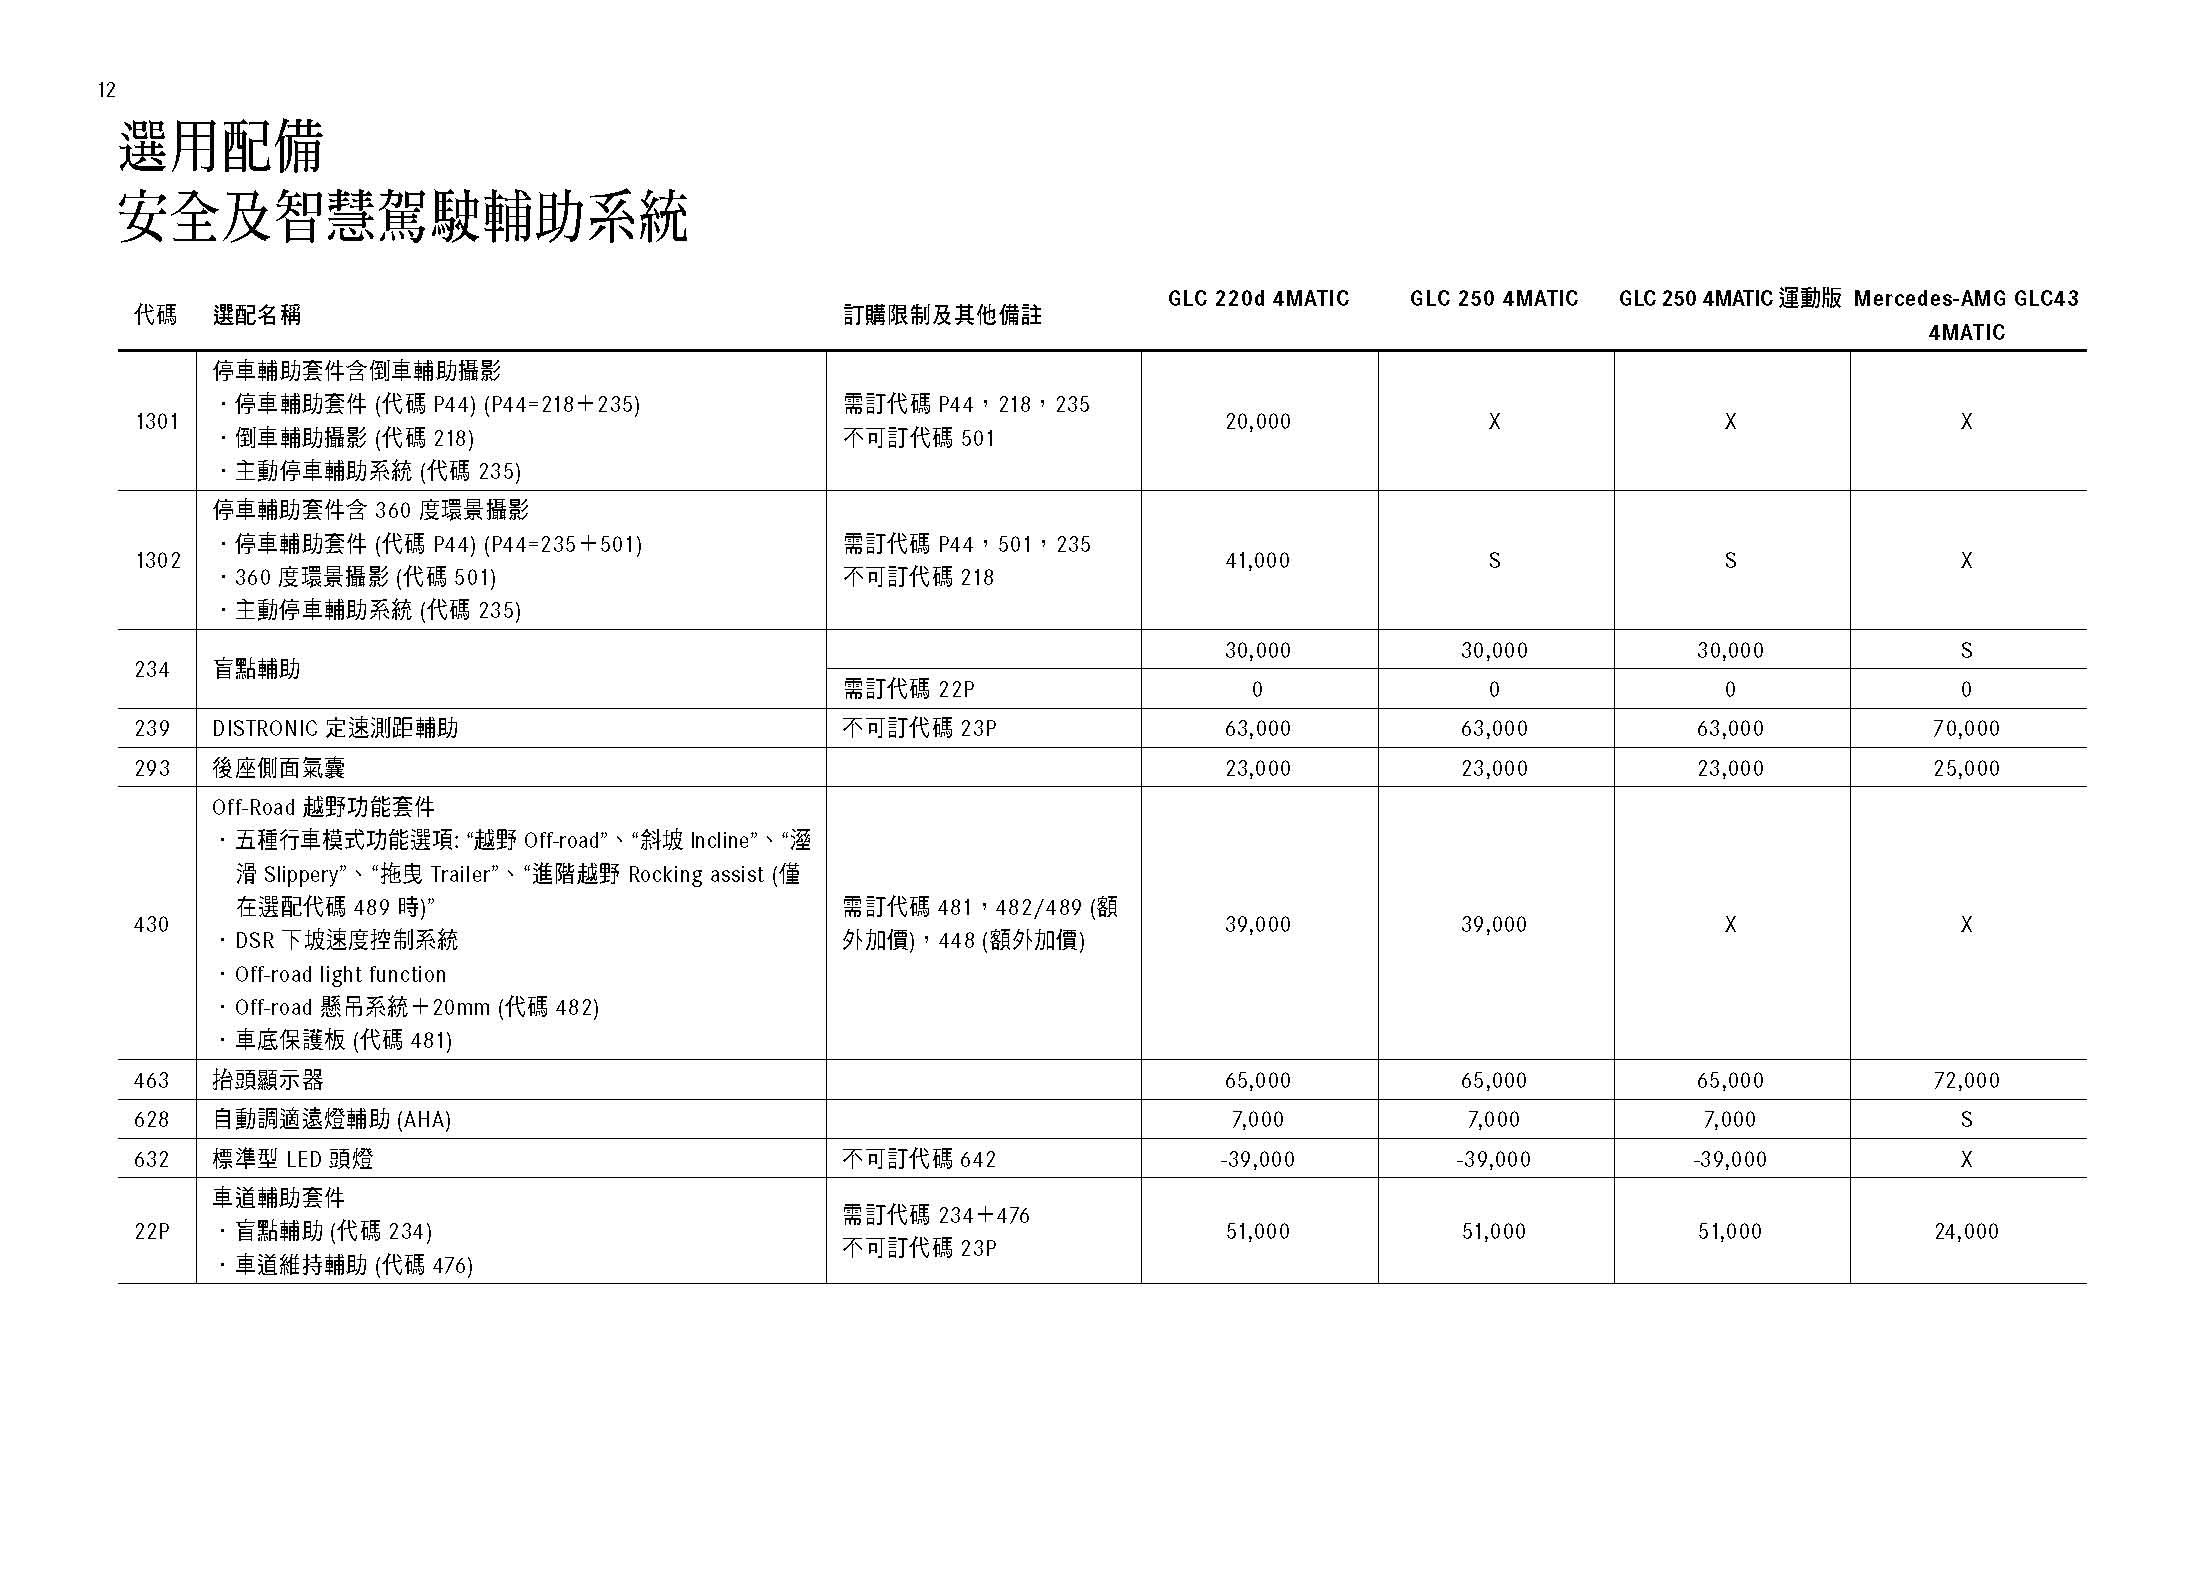 MY1718_GLC規格配備表20170929_頁面_12